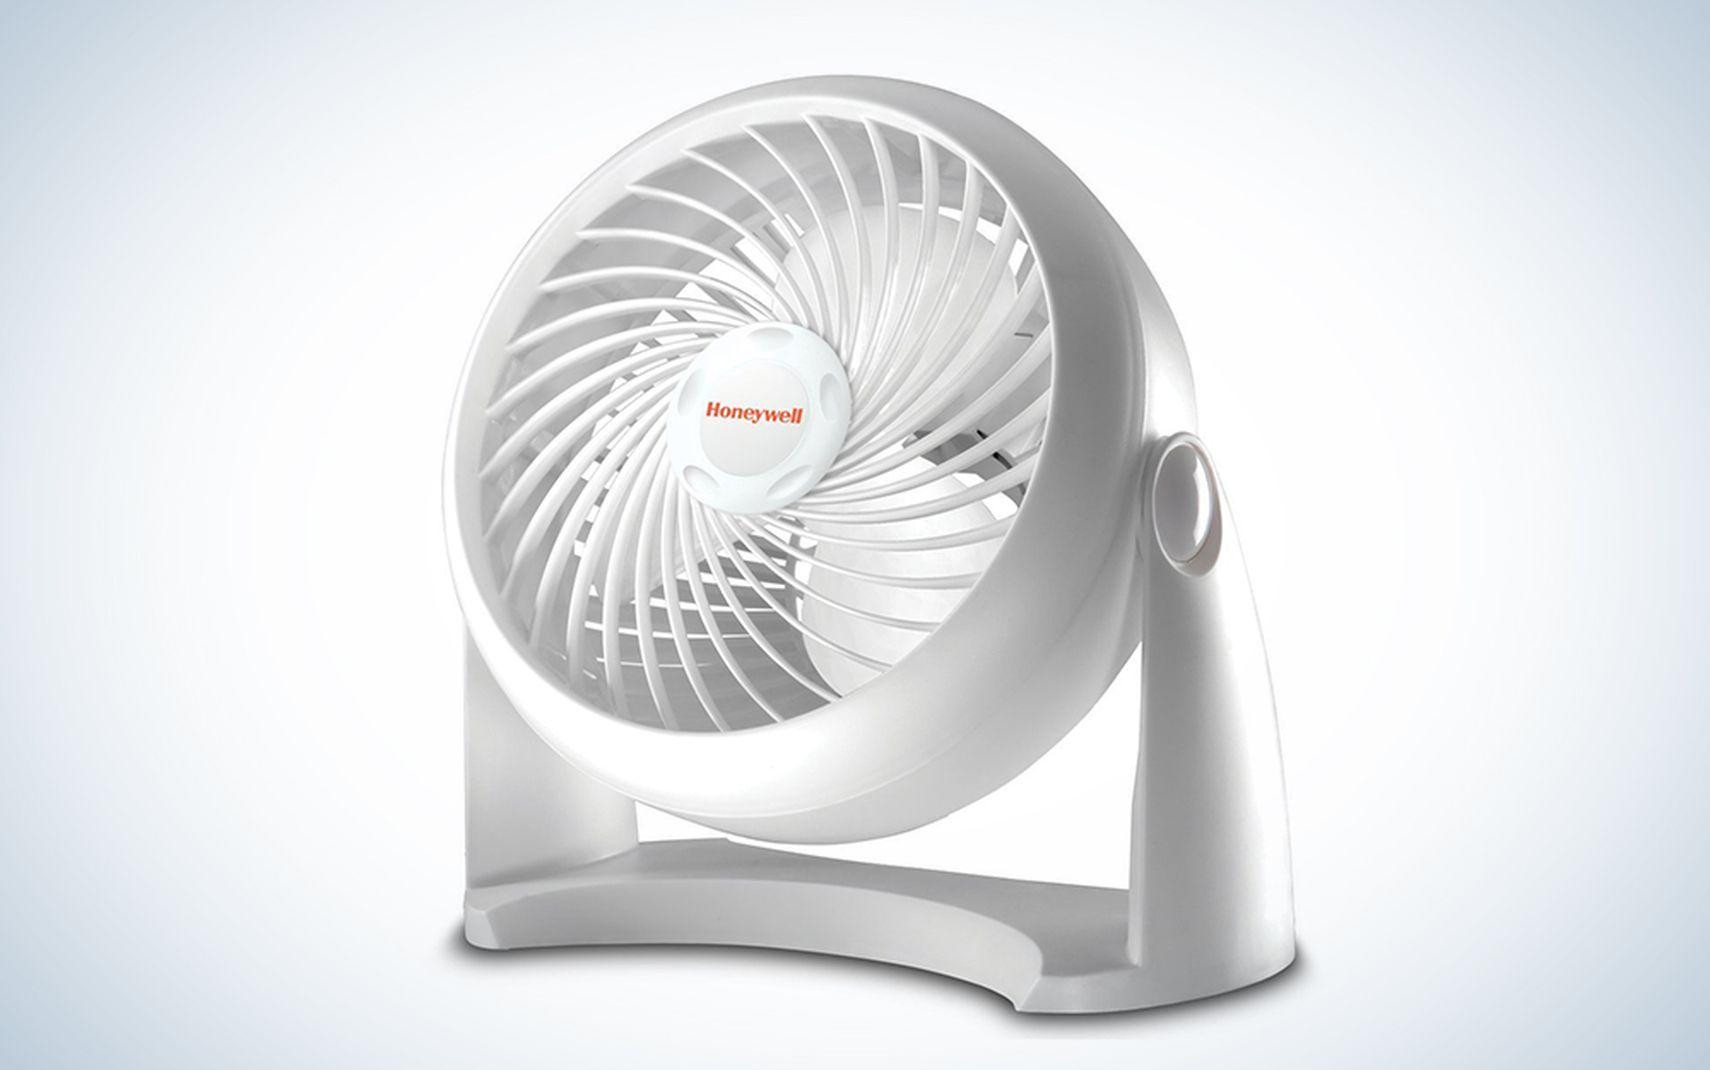 Honeywell Tabletop Air-Circulator Fan.